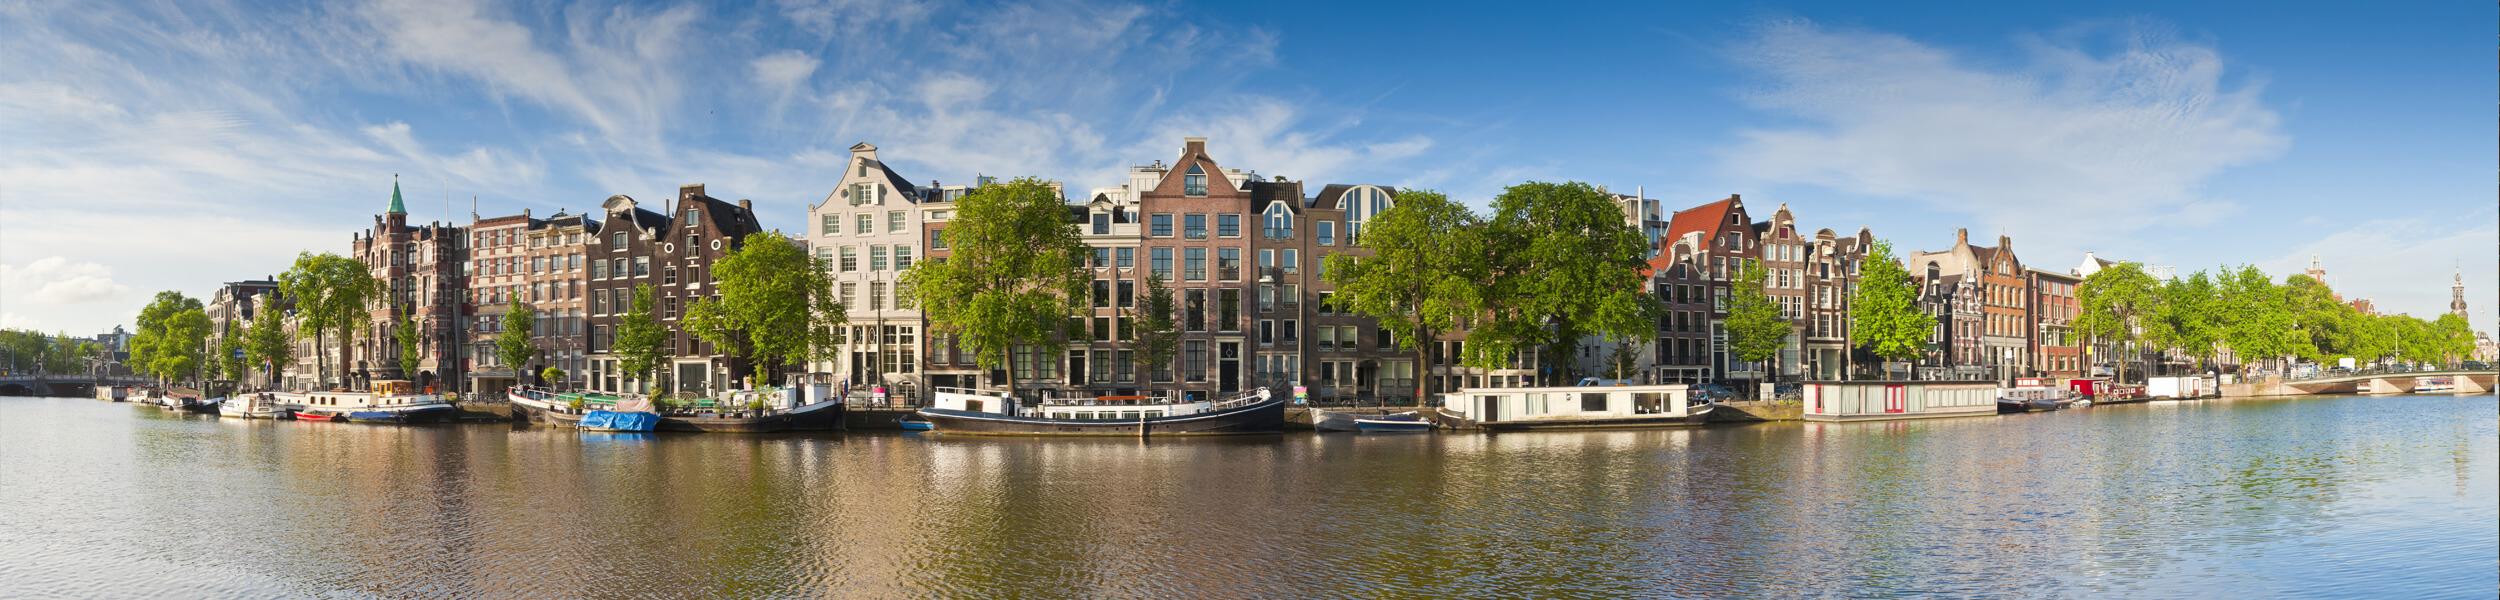 Adobe/Digital Marketing Solution Architect Amsterdam, The Netherlands